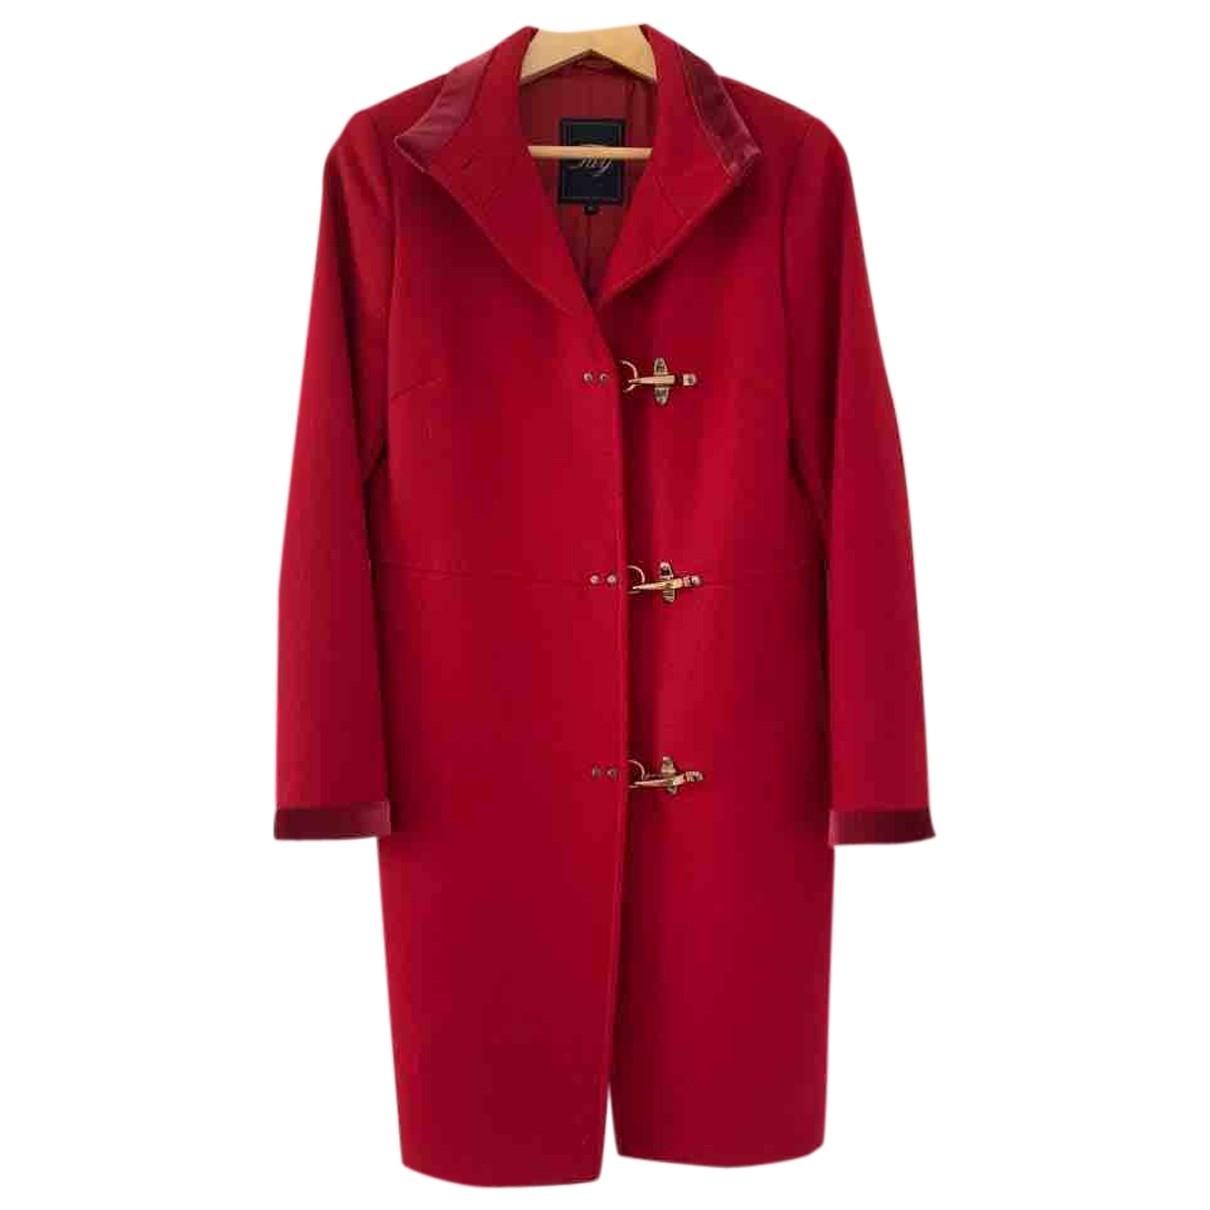 Fay \N Red Wool coat for Women L International